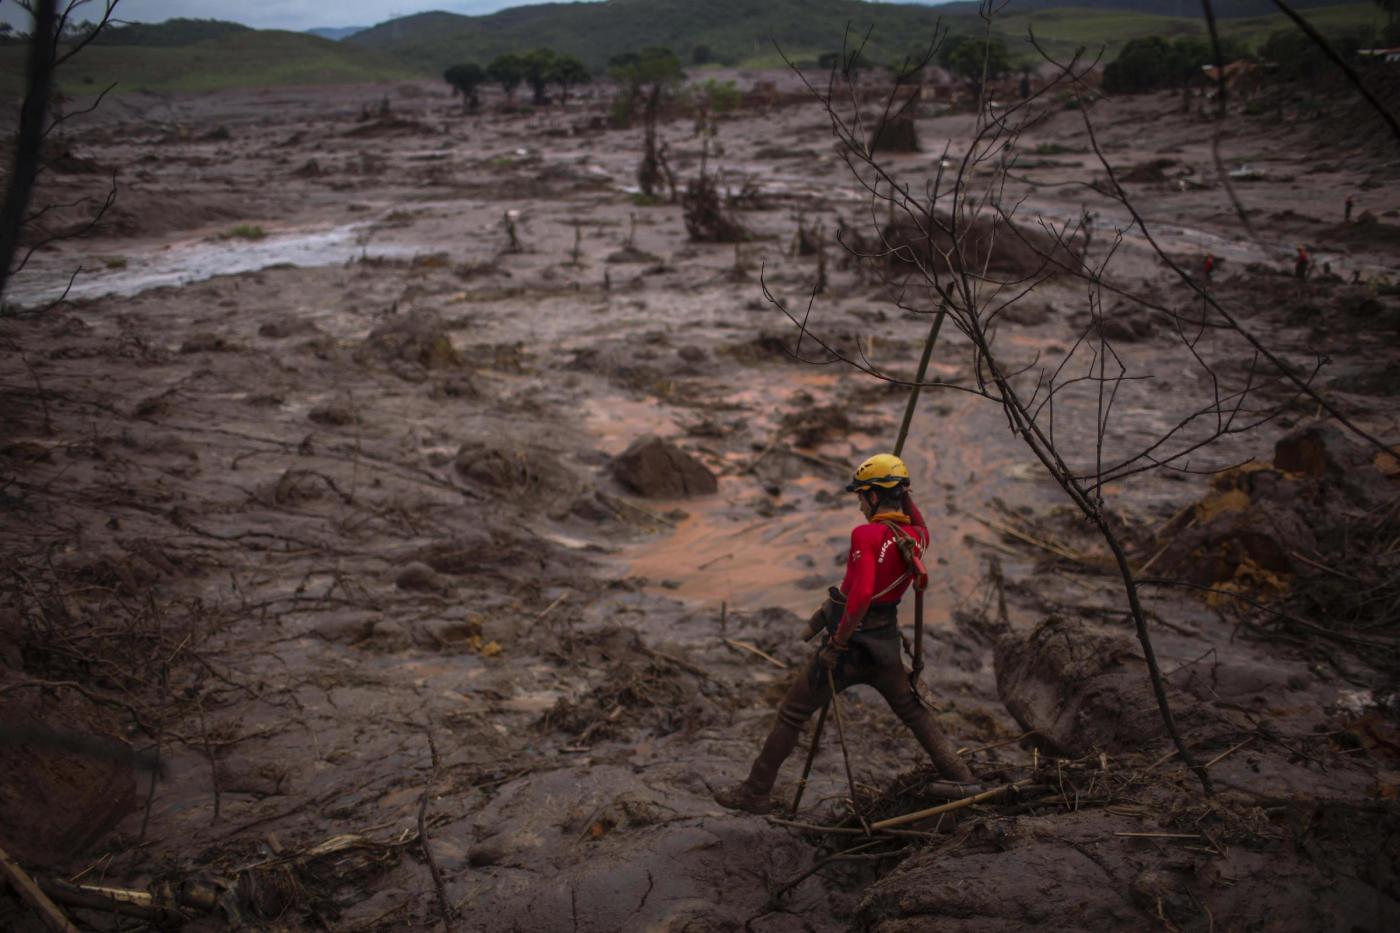 Crollo dighe in Brasile: disastro ambientale senza precedenti